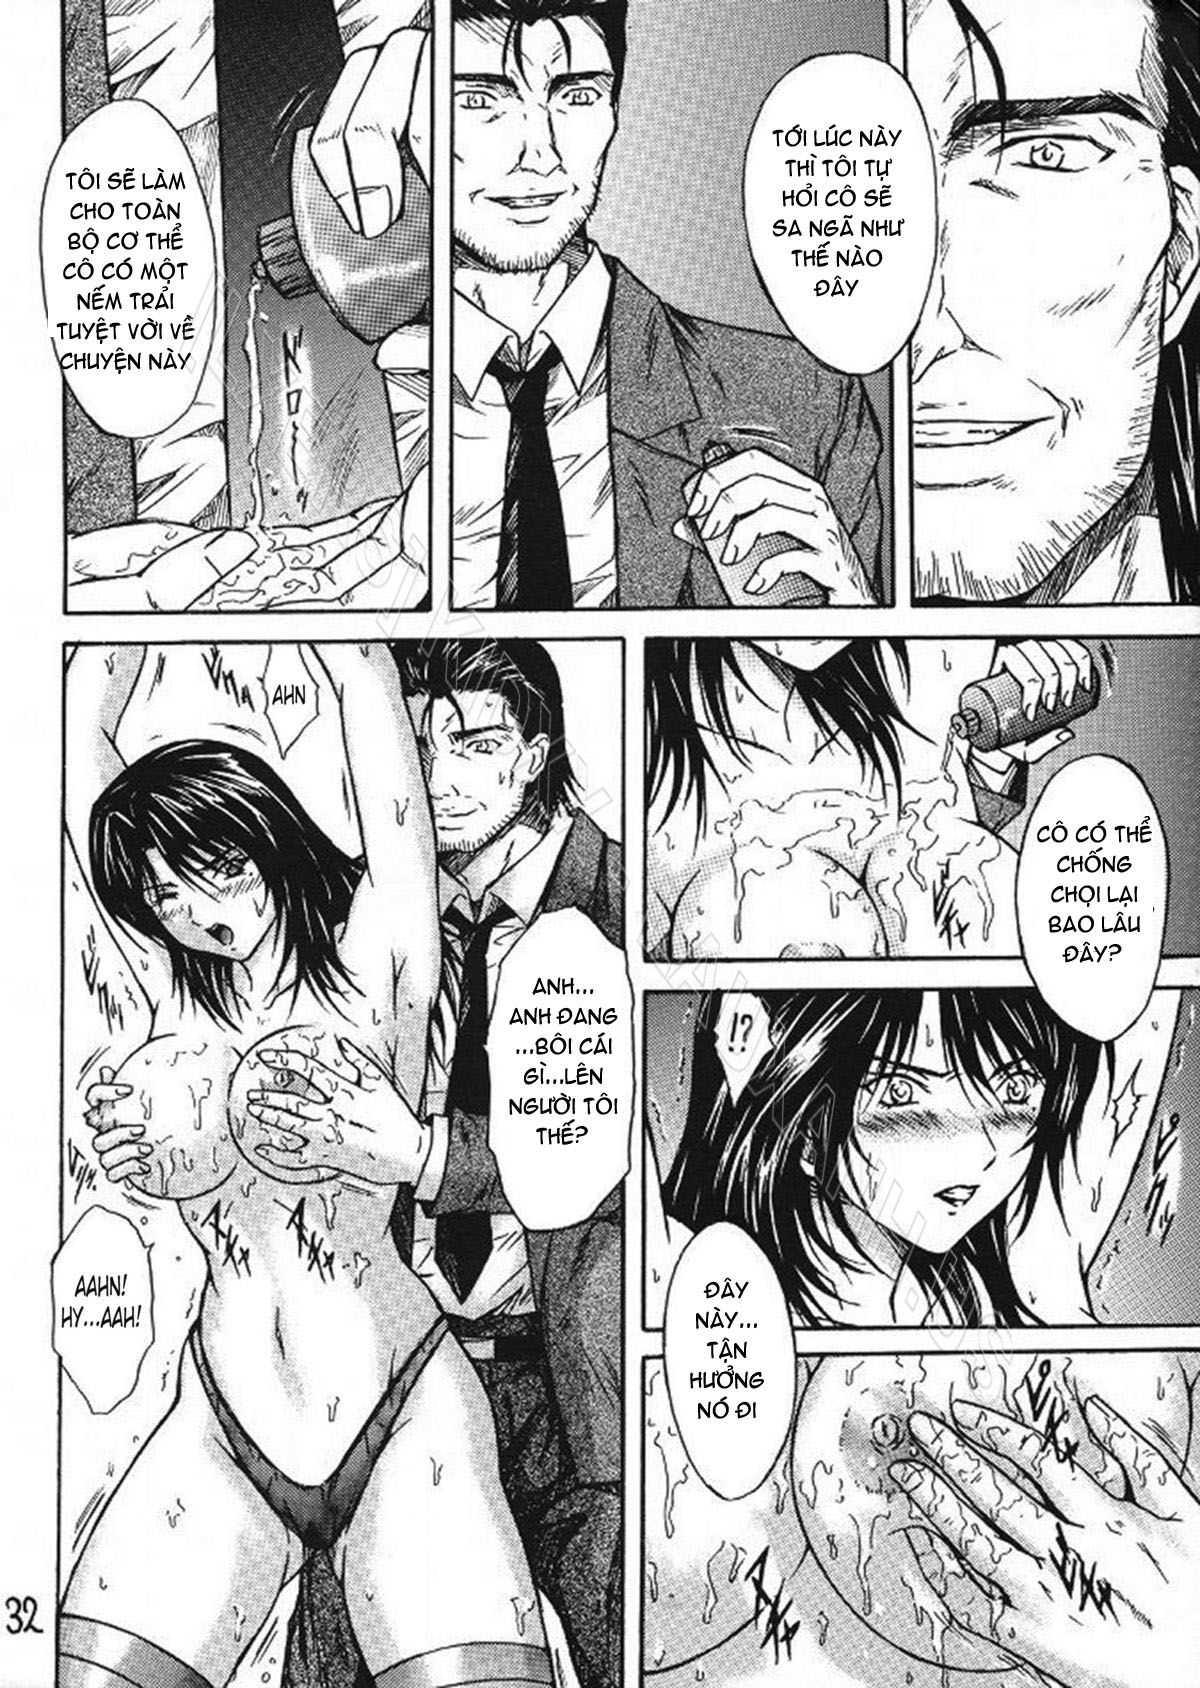 TruyenHay.Com - Ảnh 31 - Ryoujoku Rensa Chapter 2